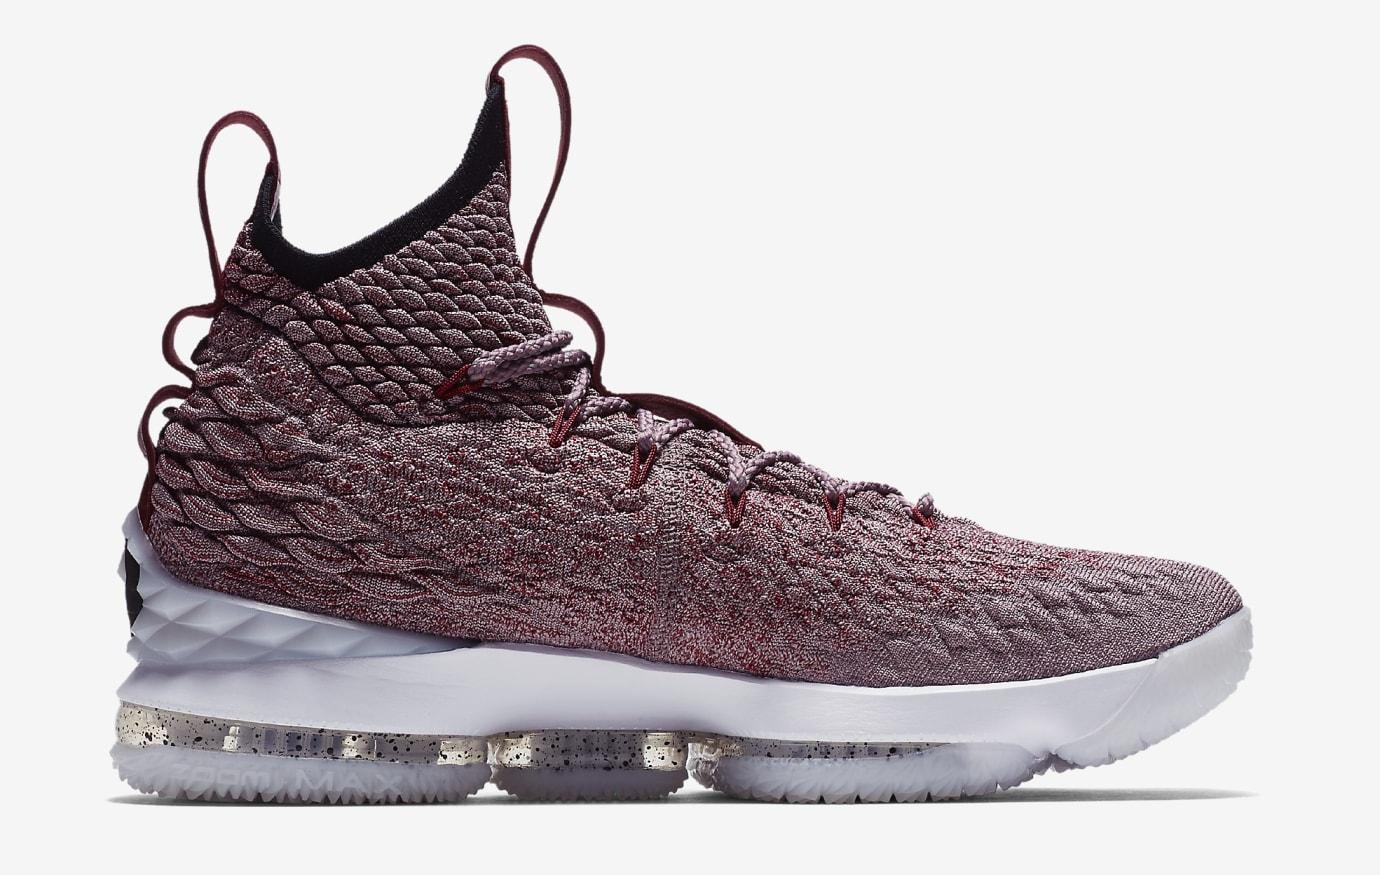 Nike LeBron 15 'Wine' 897649-201 (Medial)